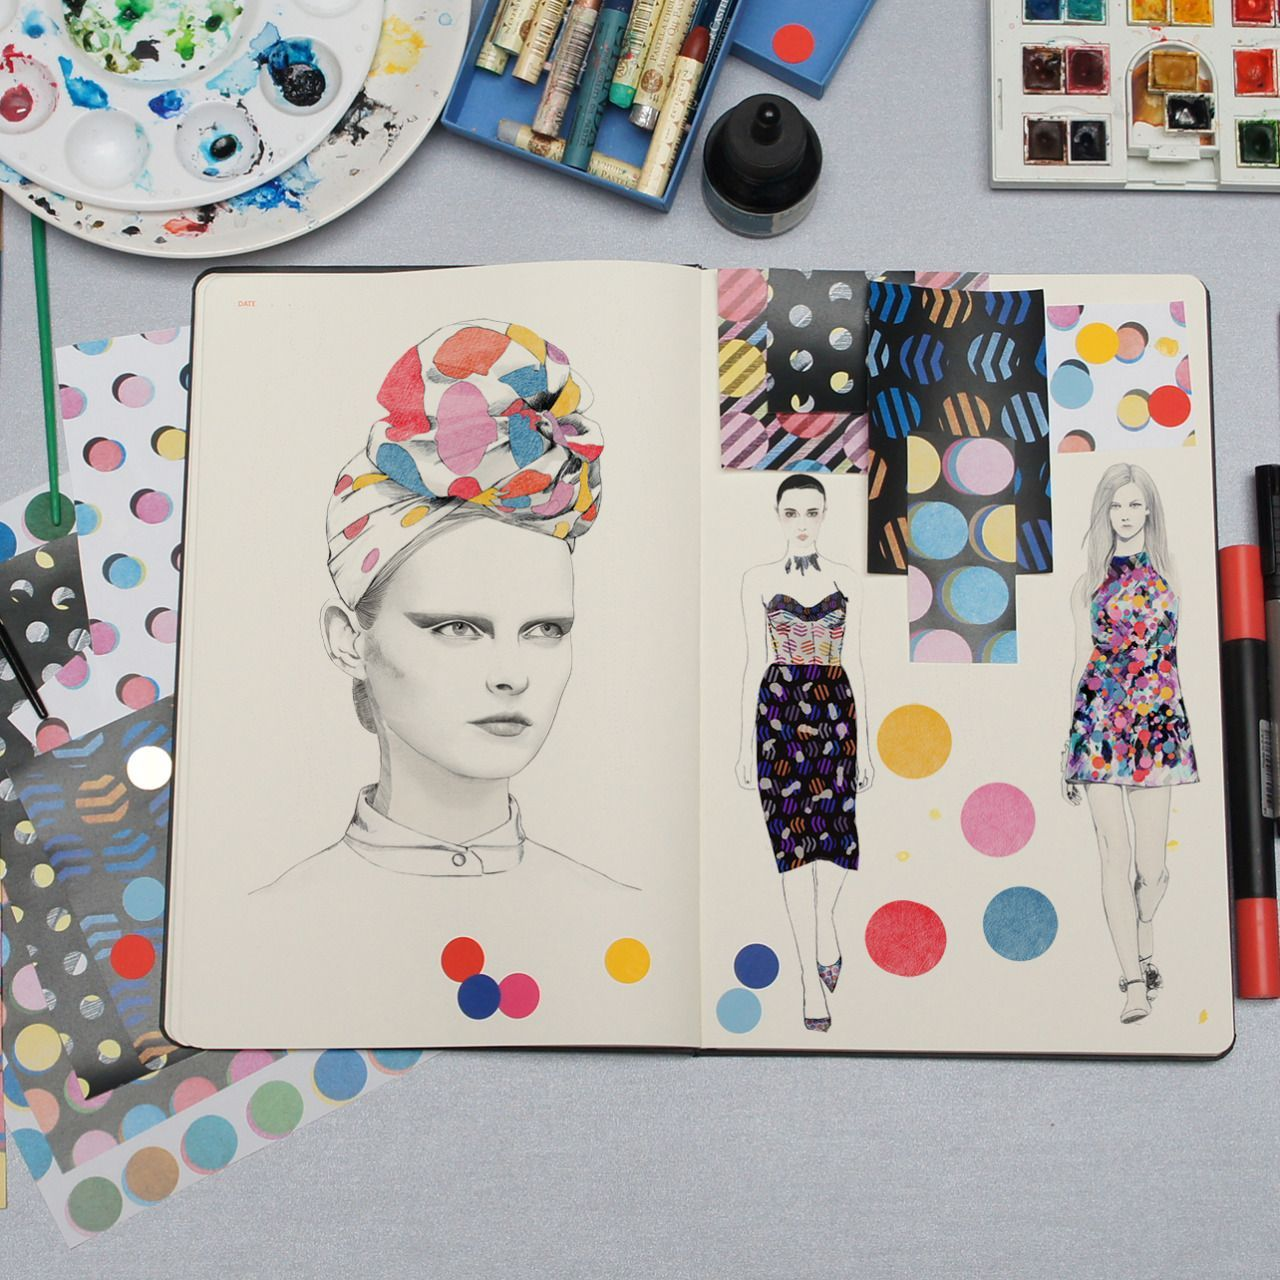 Fashionary Hand - A Fashion Illustration Blog-#blog #fashion #fashionary #fasion2019 #fasionillustration #Hand #highfasion #illustration #women'sfasion- Fashionary Hand – A Fashion Illustration Blog                                                                                                                                                     More